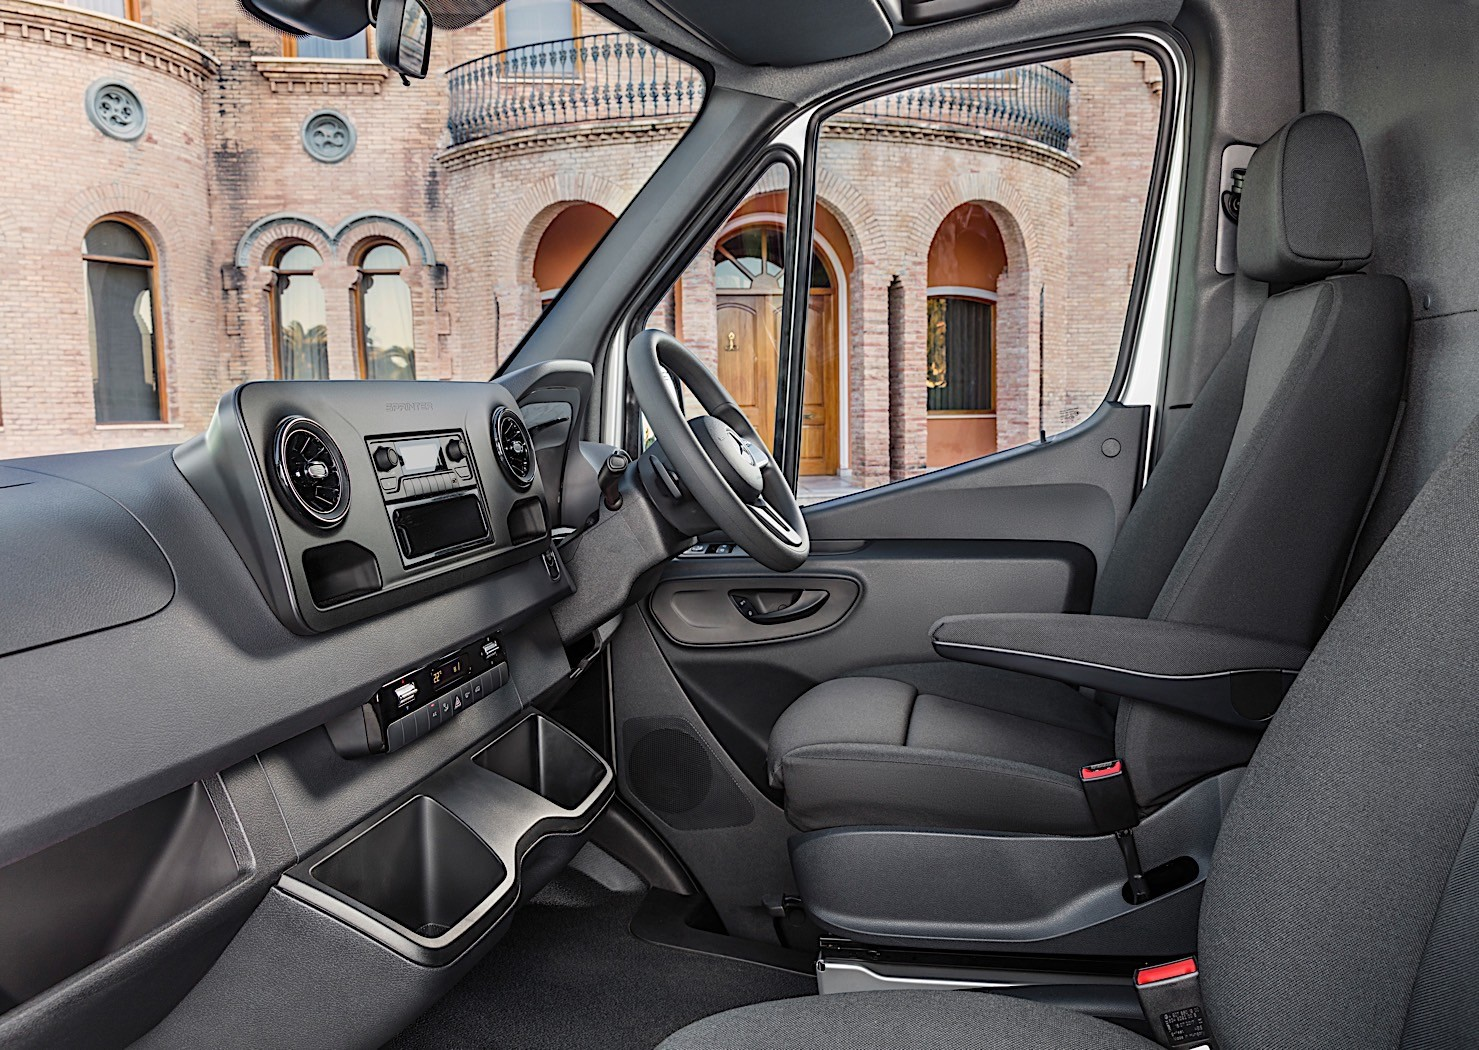 Mercedes Benz Sprinter Based Rv Reviewed By Autoblog Autoevolution